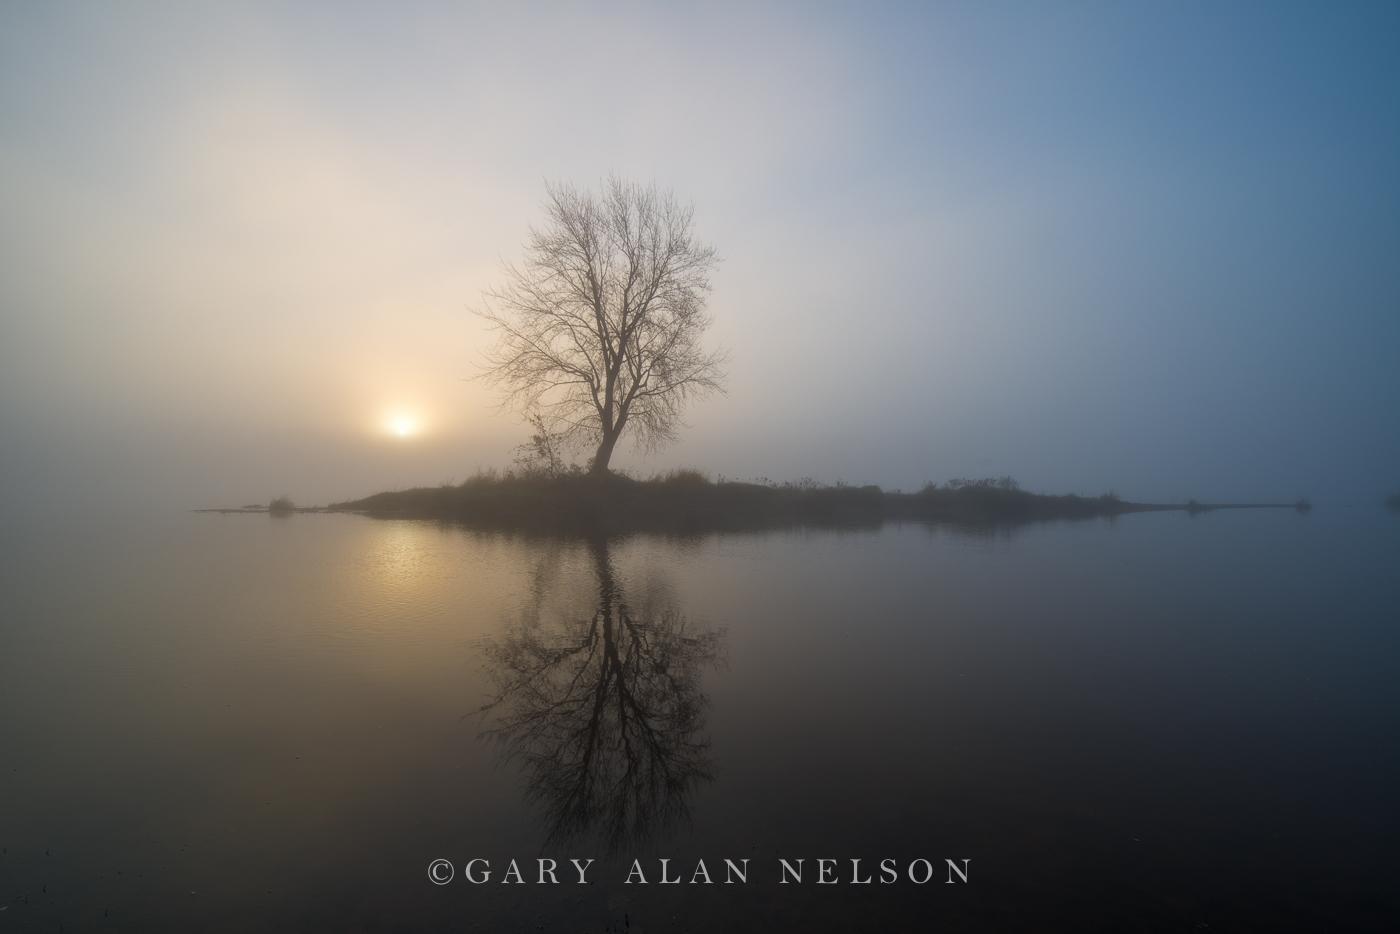 st. croix river, minnesota, sun,mislaid, national scenic river, photo